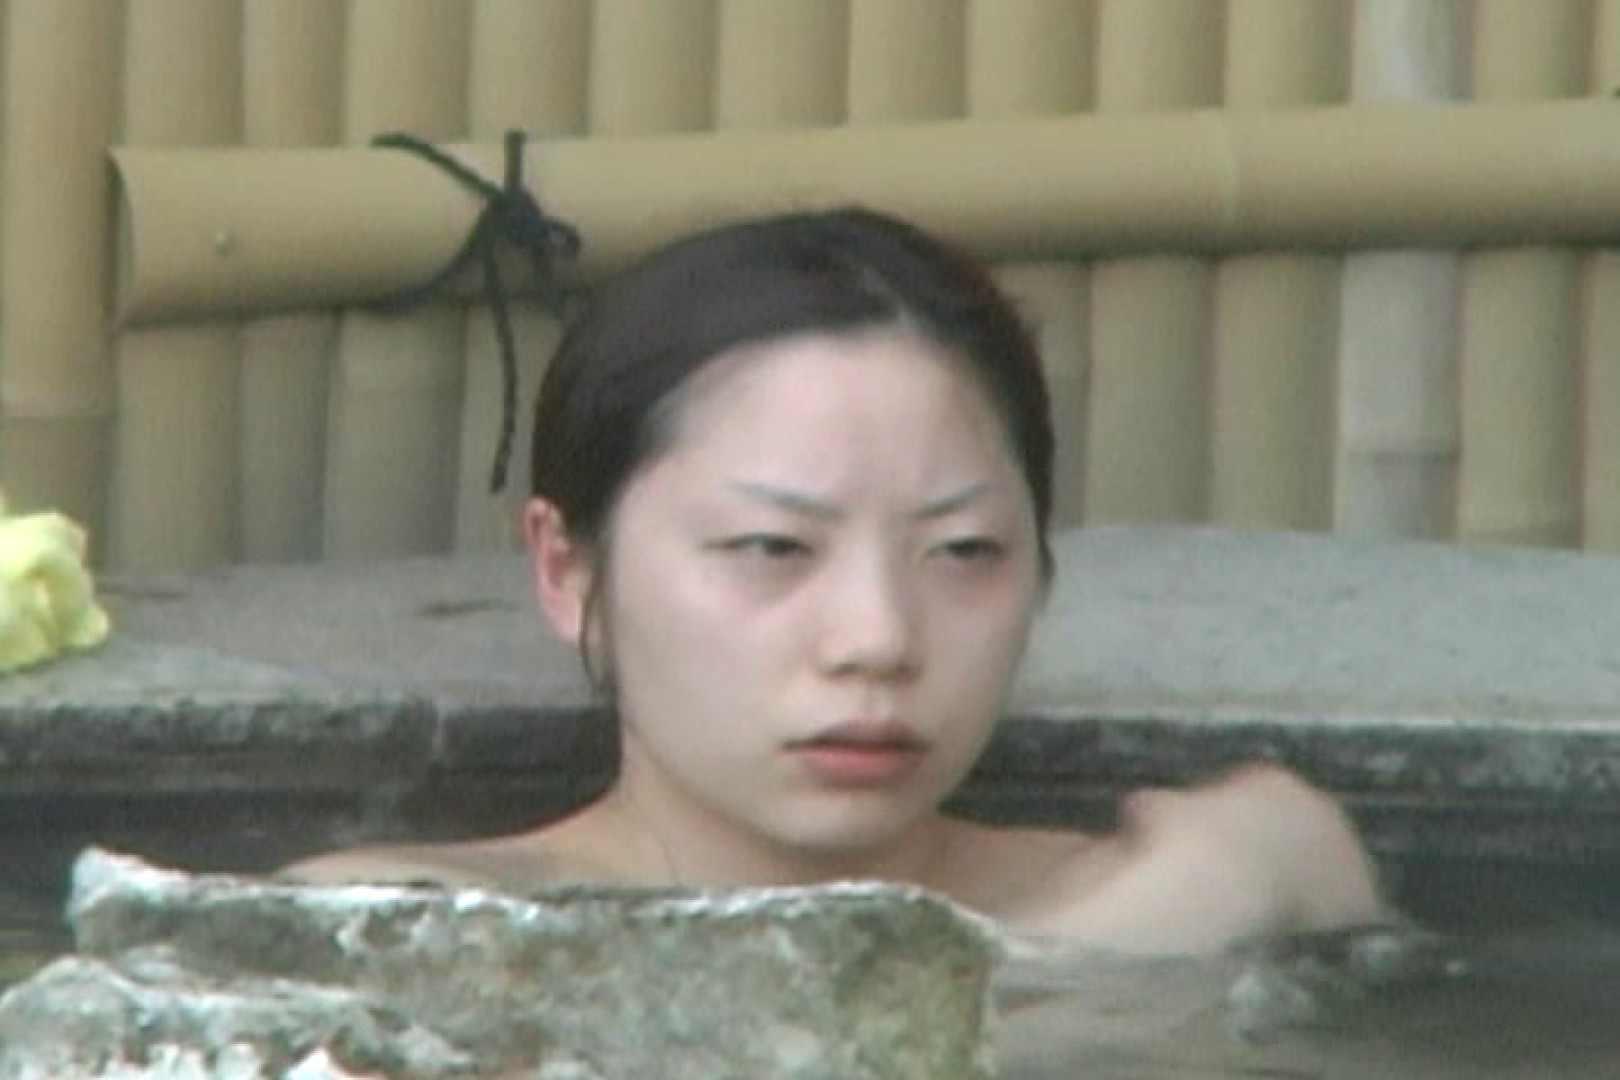 Aquaな露天風呂Vol.596 OLセックス  77画像 75